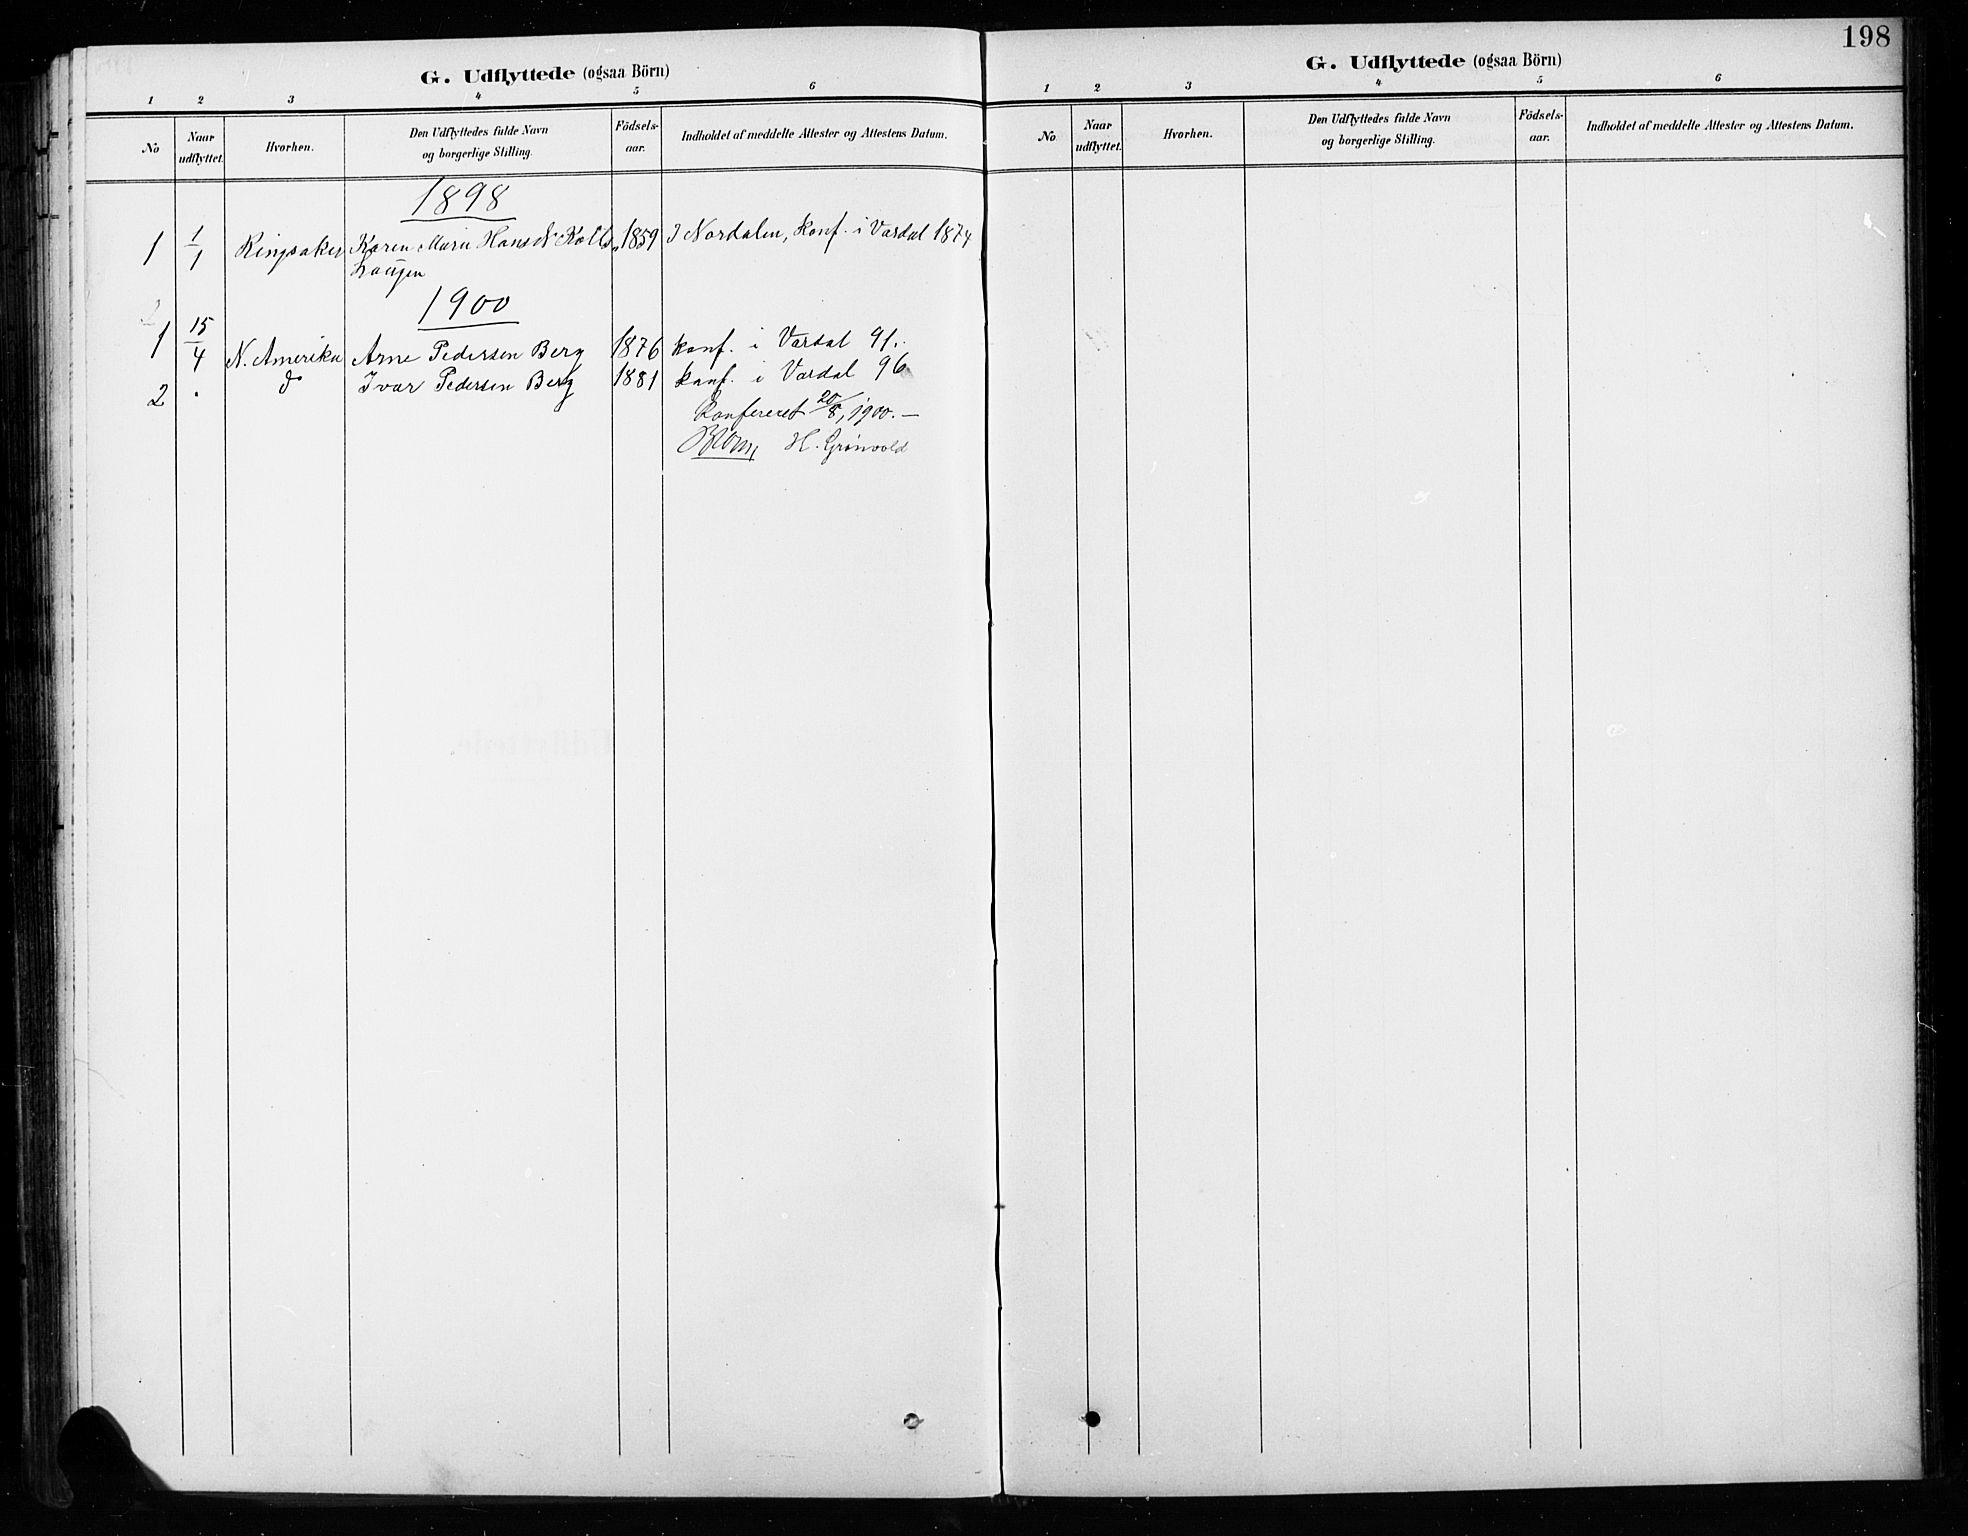 SAH, Vardal prestekontor, H/Ha/Hab/L0010: Klokkerbok nr. 10, 1895-1903, s. 198